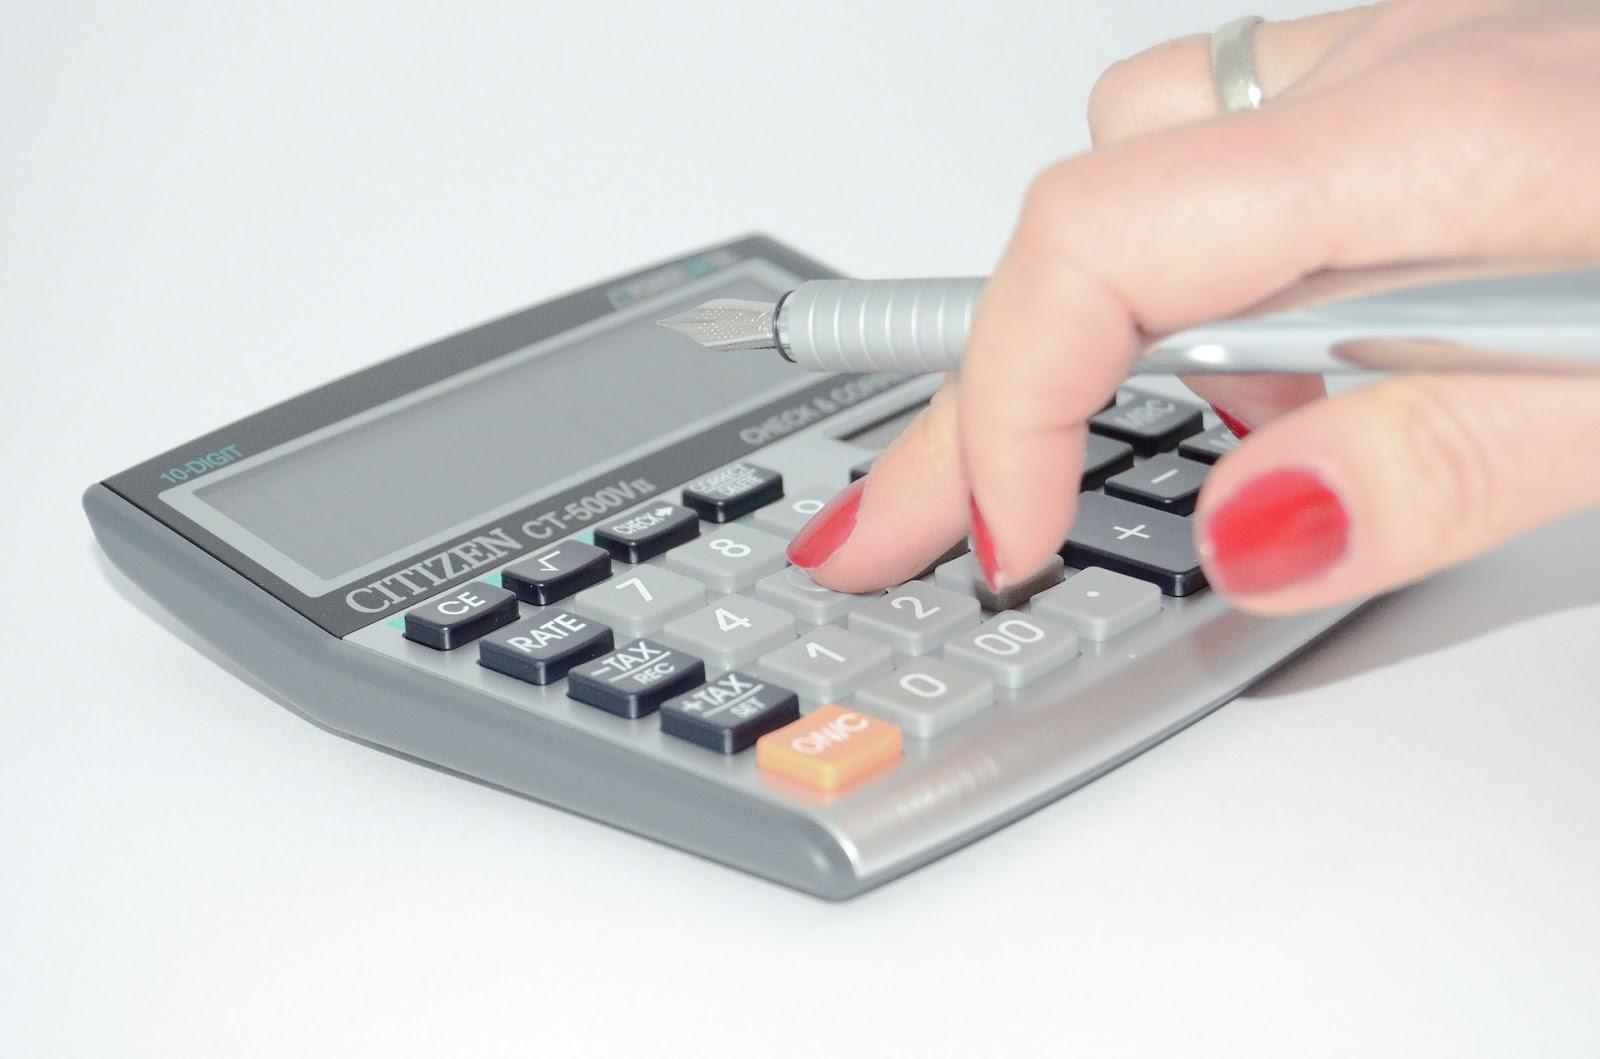 calculating expenses using a calculator